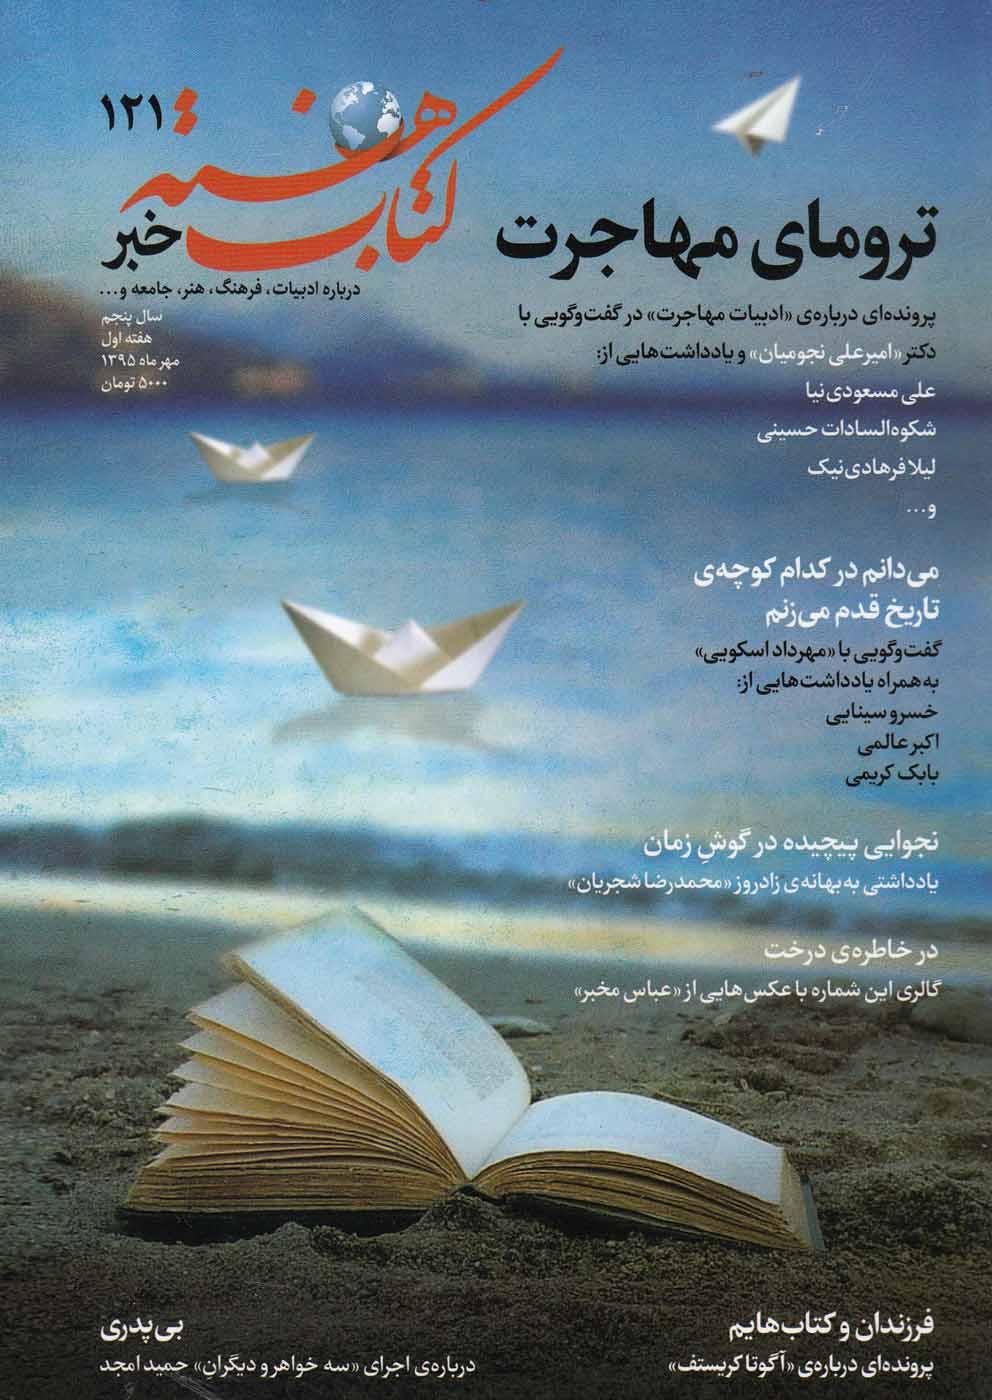 مجله كتاب هفته(شمارهپياپي121)هفتهنامه